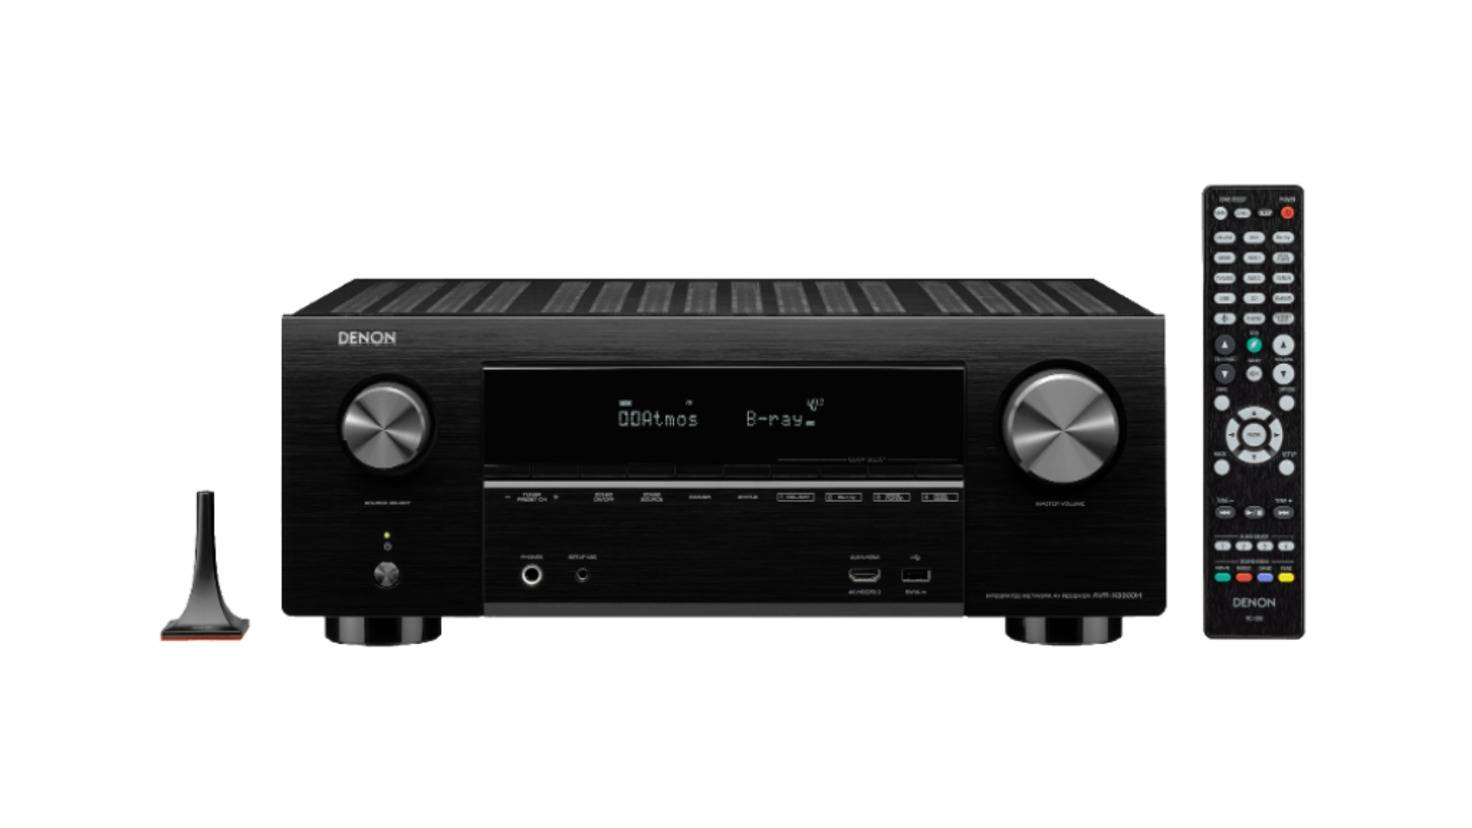 Denon-AVR-X3500H-Receiver